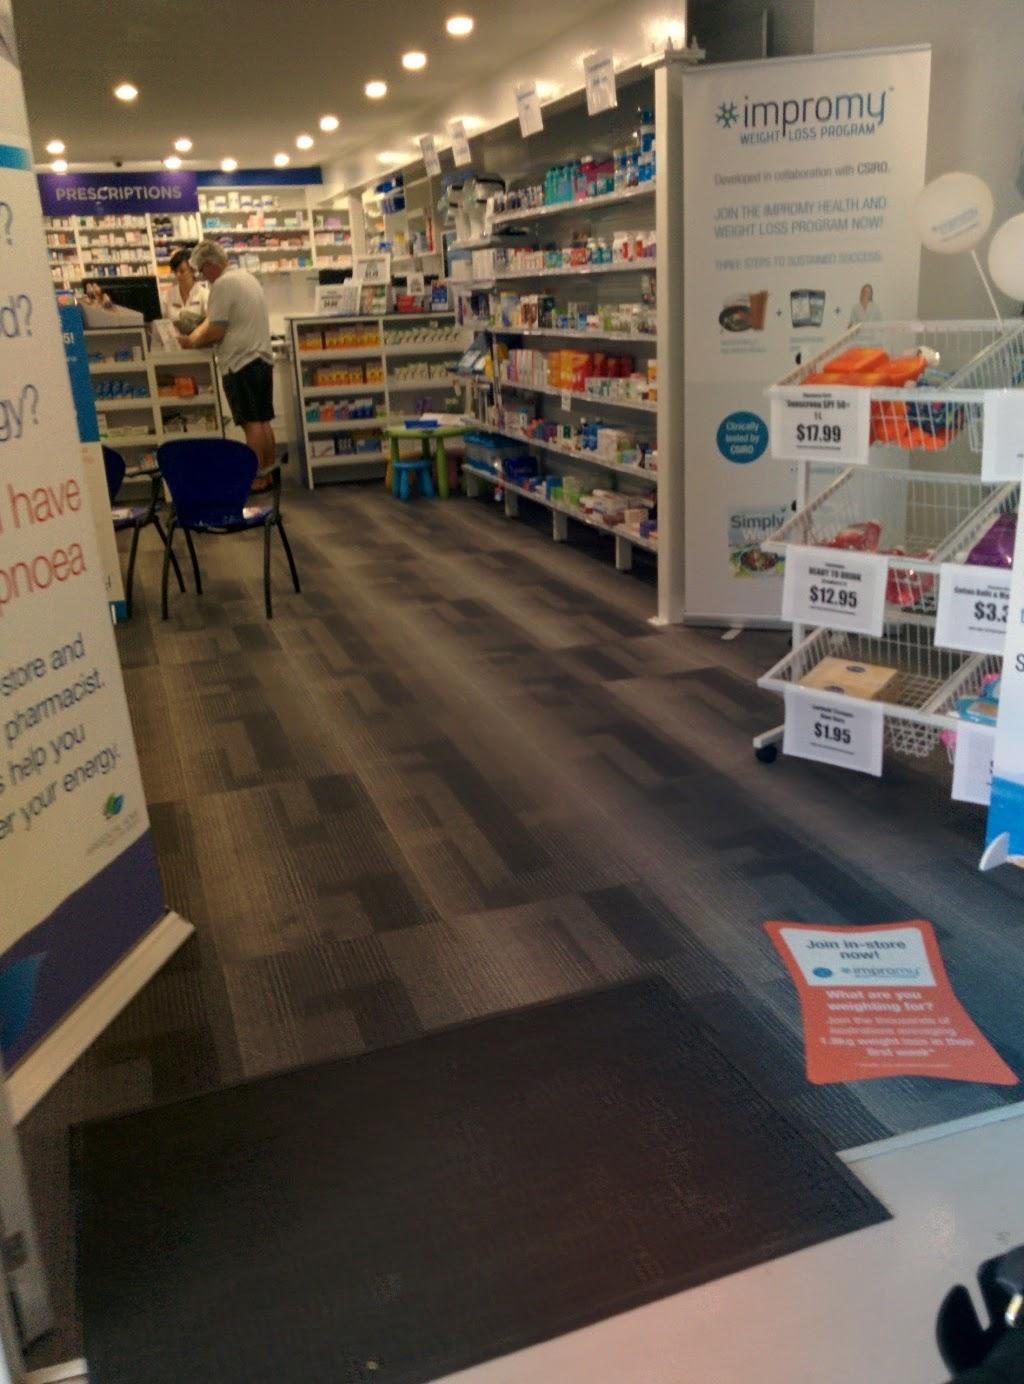 Priority Health Pharmacy Medowie (Formerly Forrest Mall Prescrip | health | 35 Ferodale Rd, Medowie NSW 2318, Australia | 0249829516 OR +61 2 4982 9516